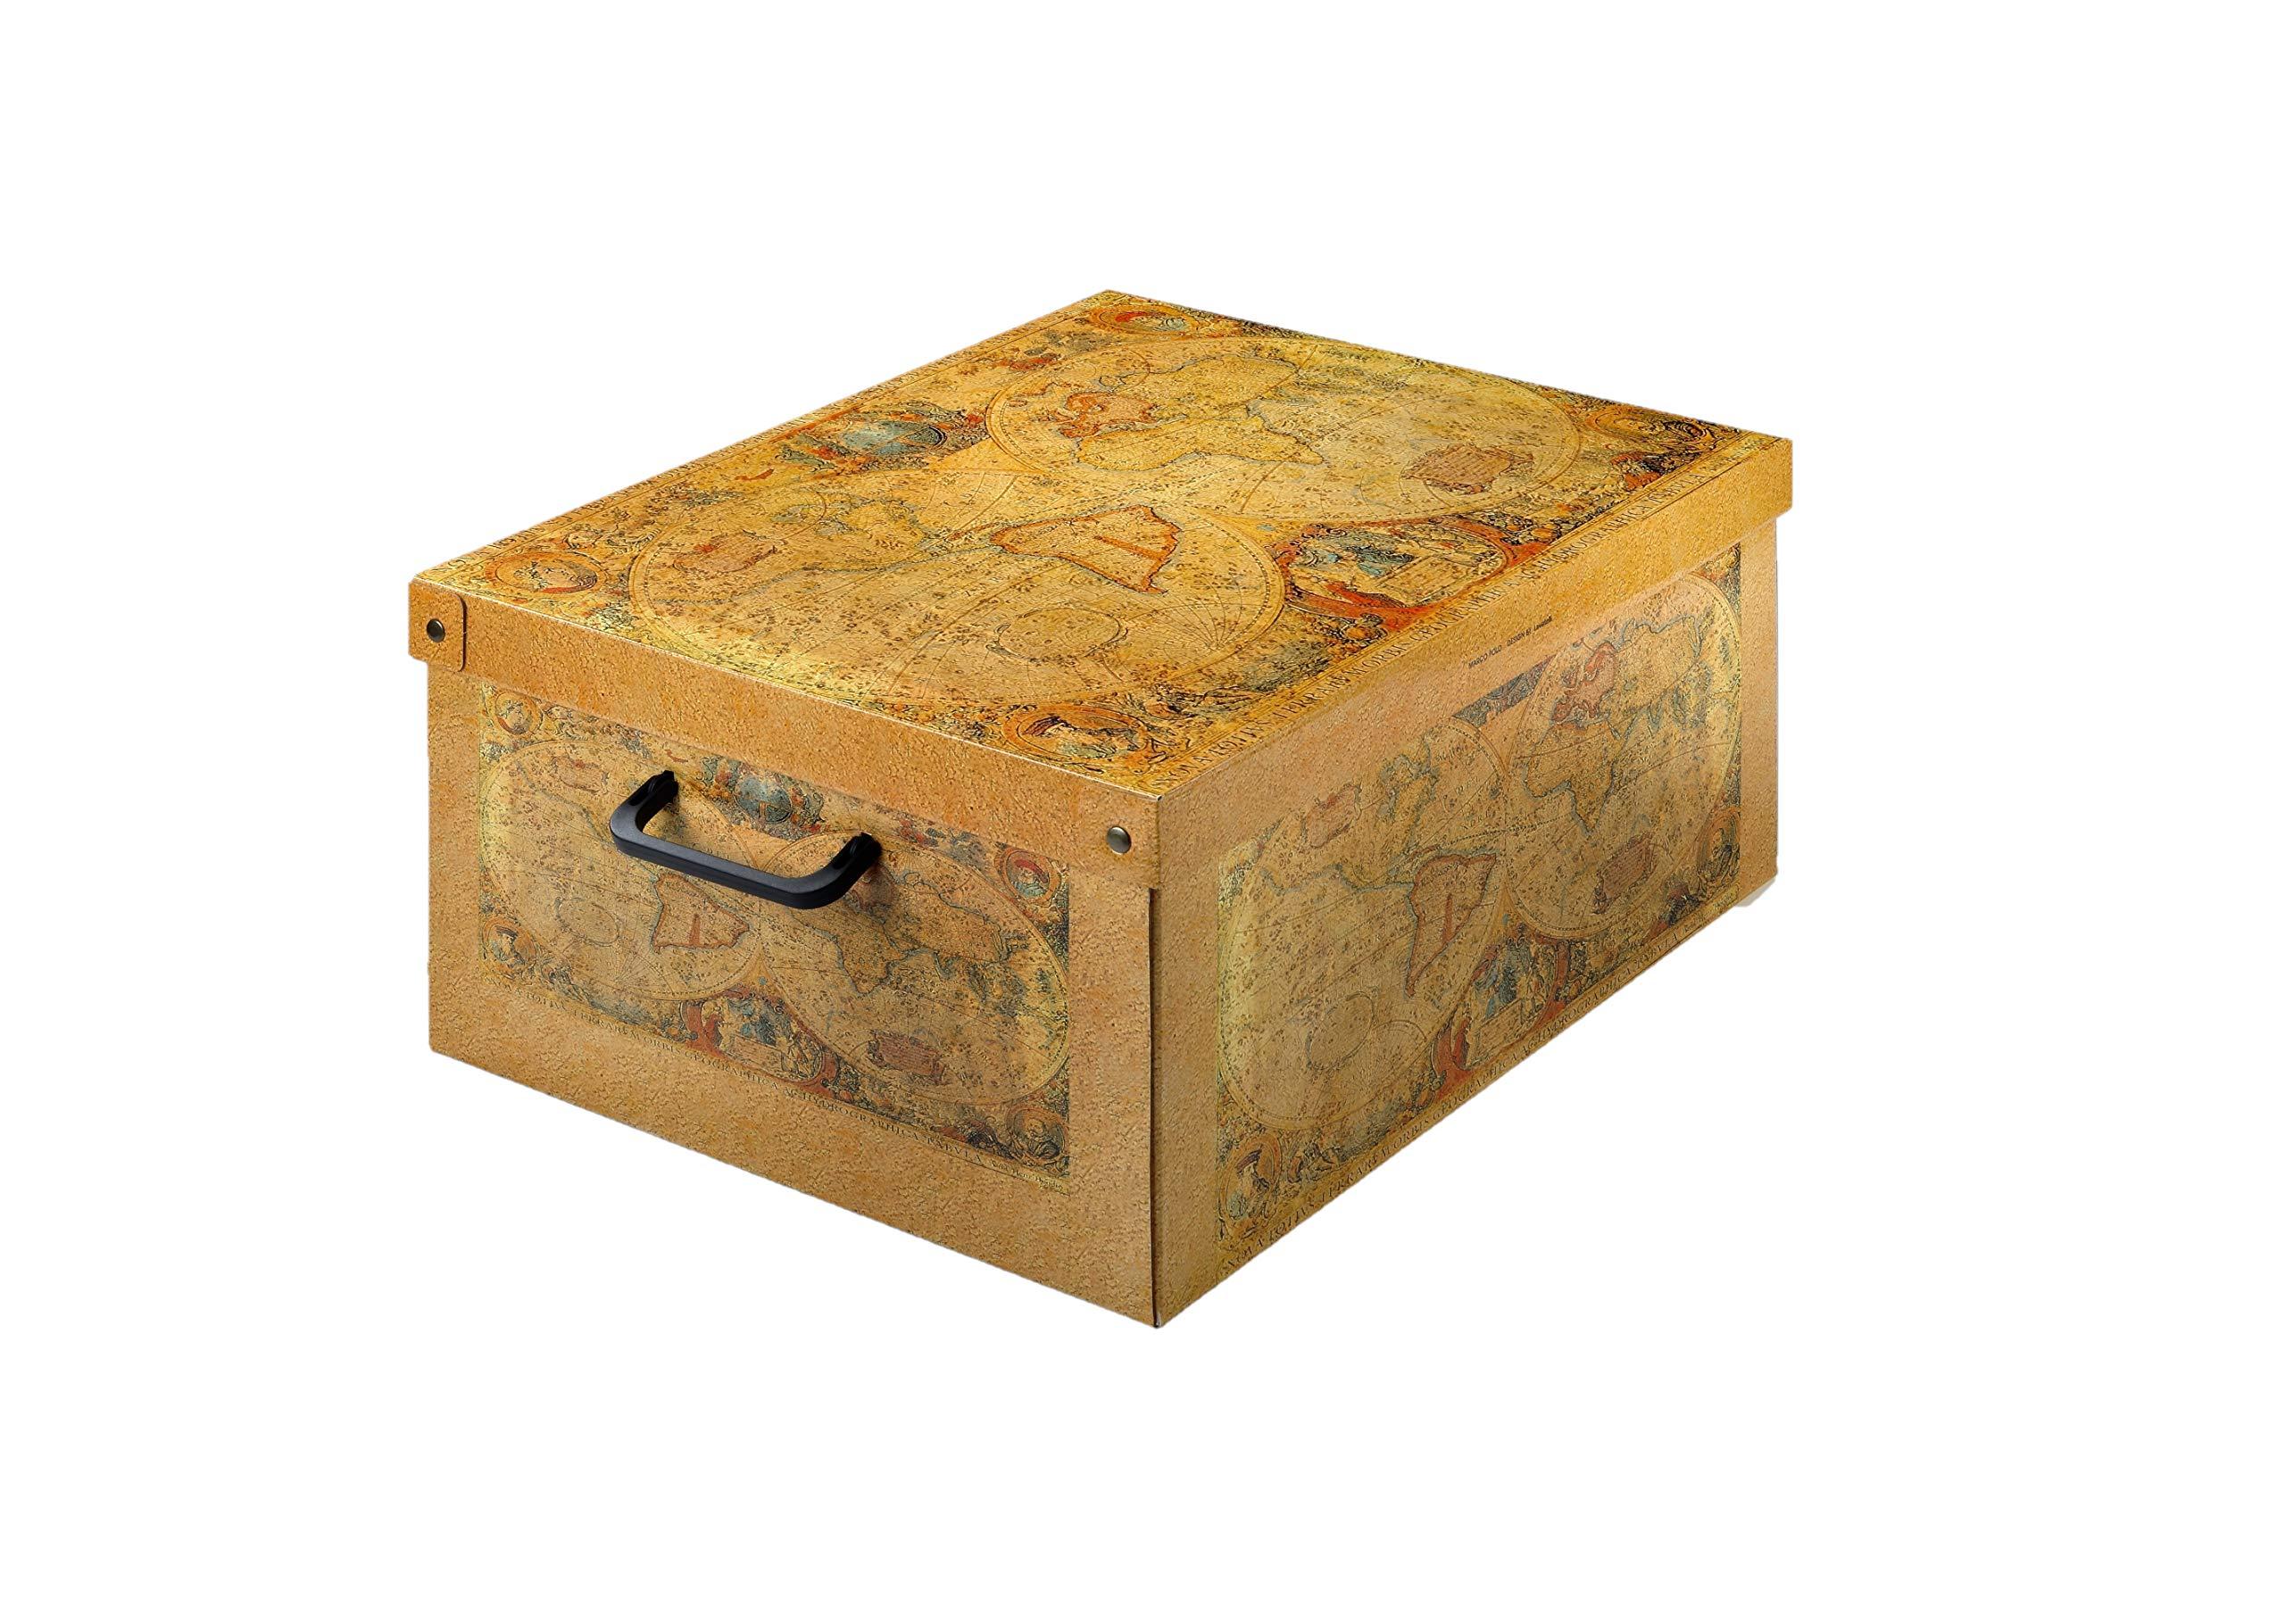 Kanguru Caja de Almacenamiento en cartòn Lavatelli, Modelo Marco Polo, Media 32x42x21cm: Amazon.es: Hogar